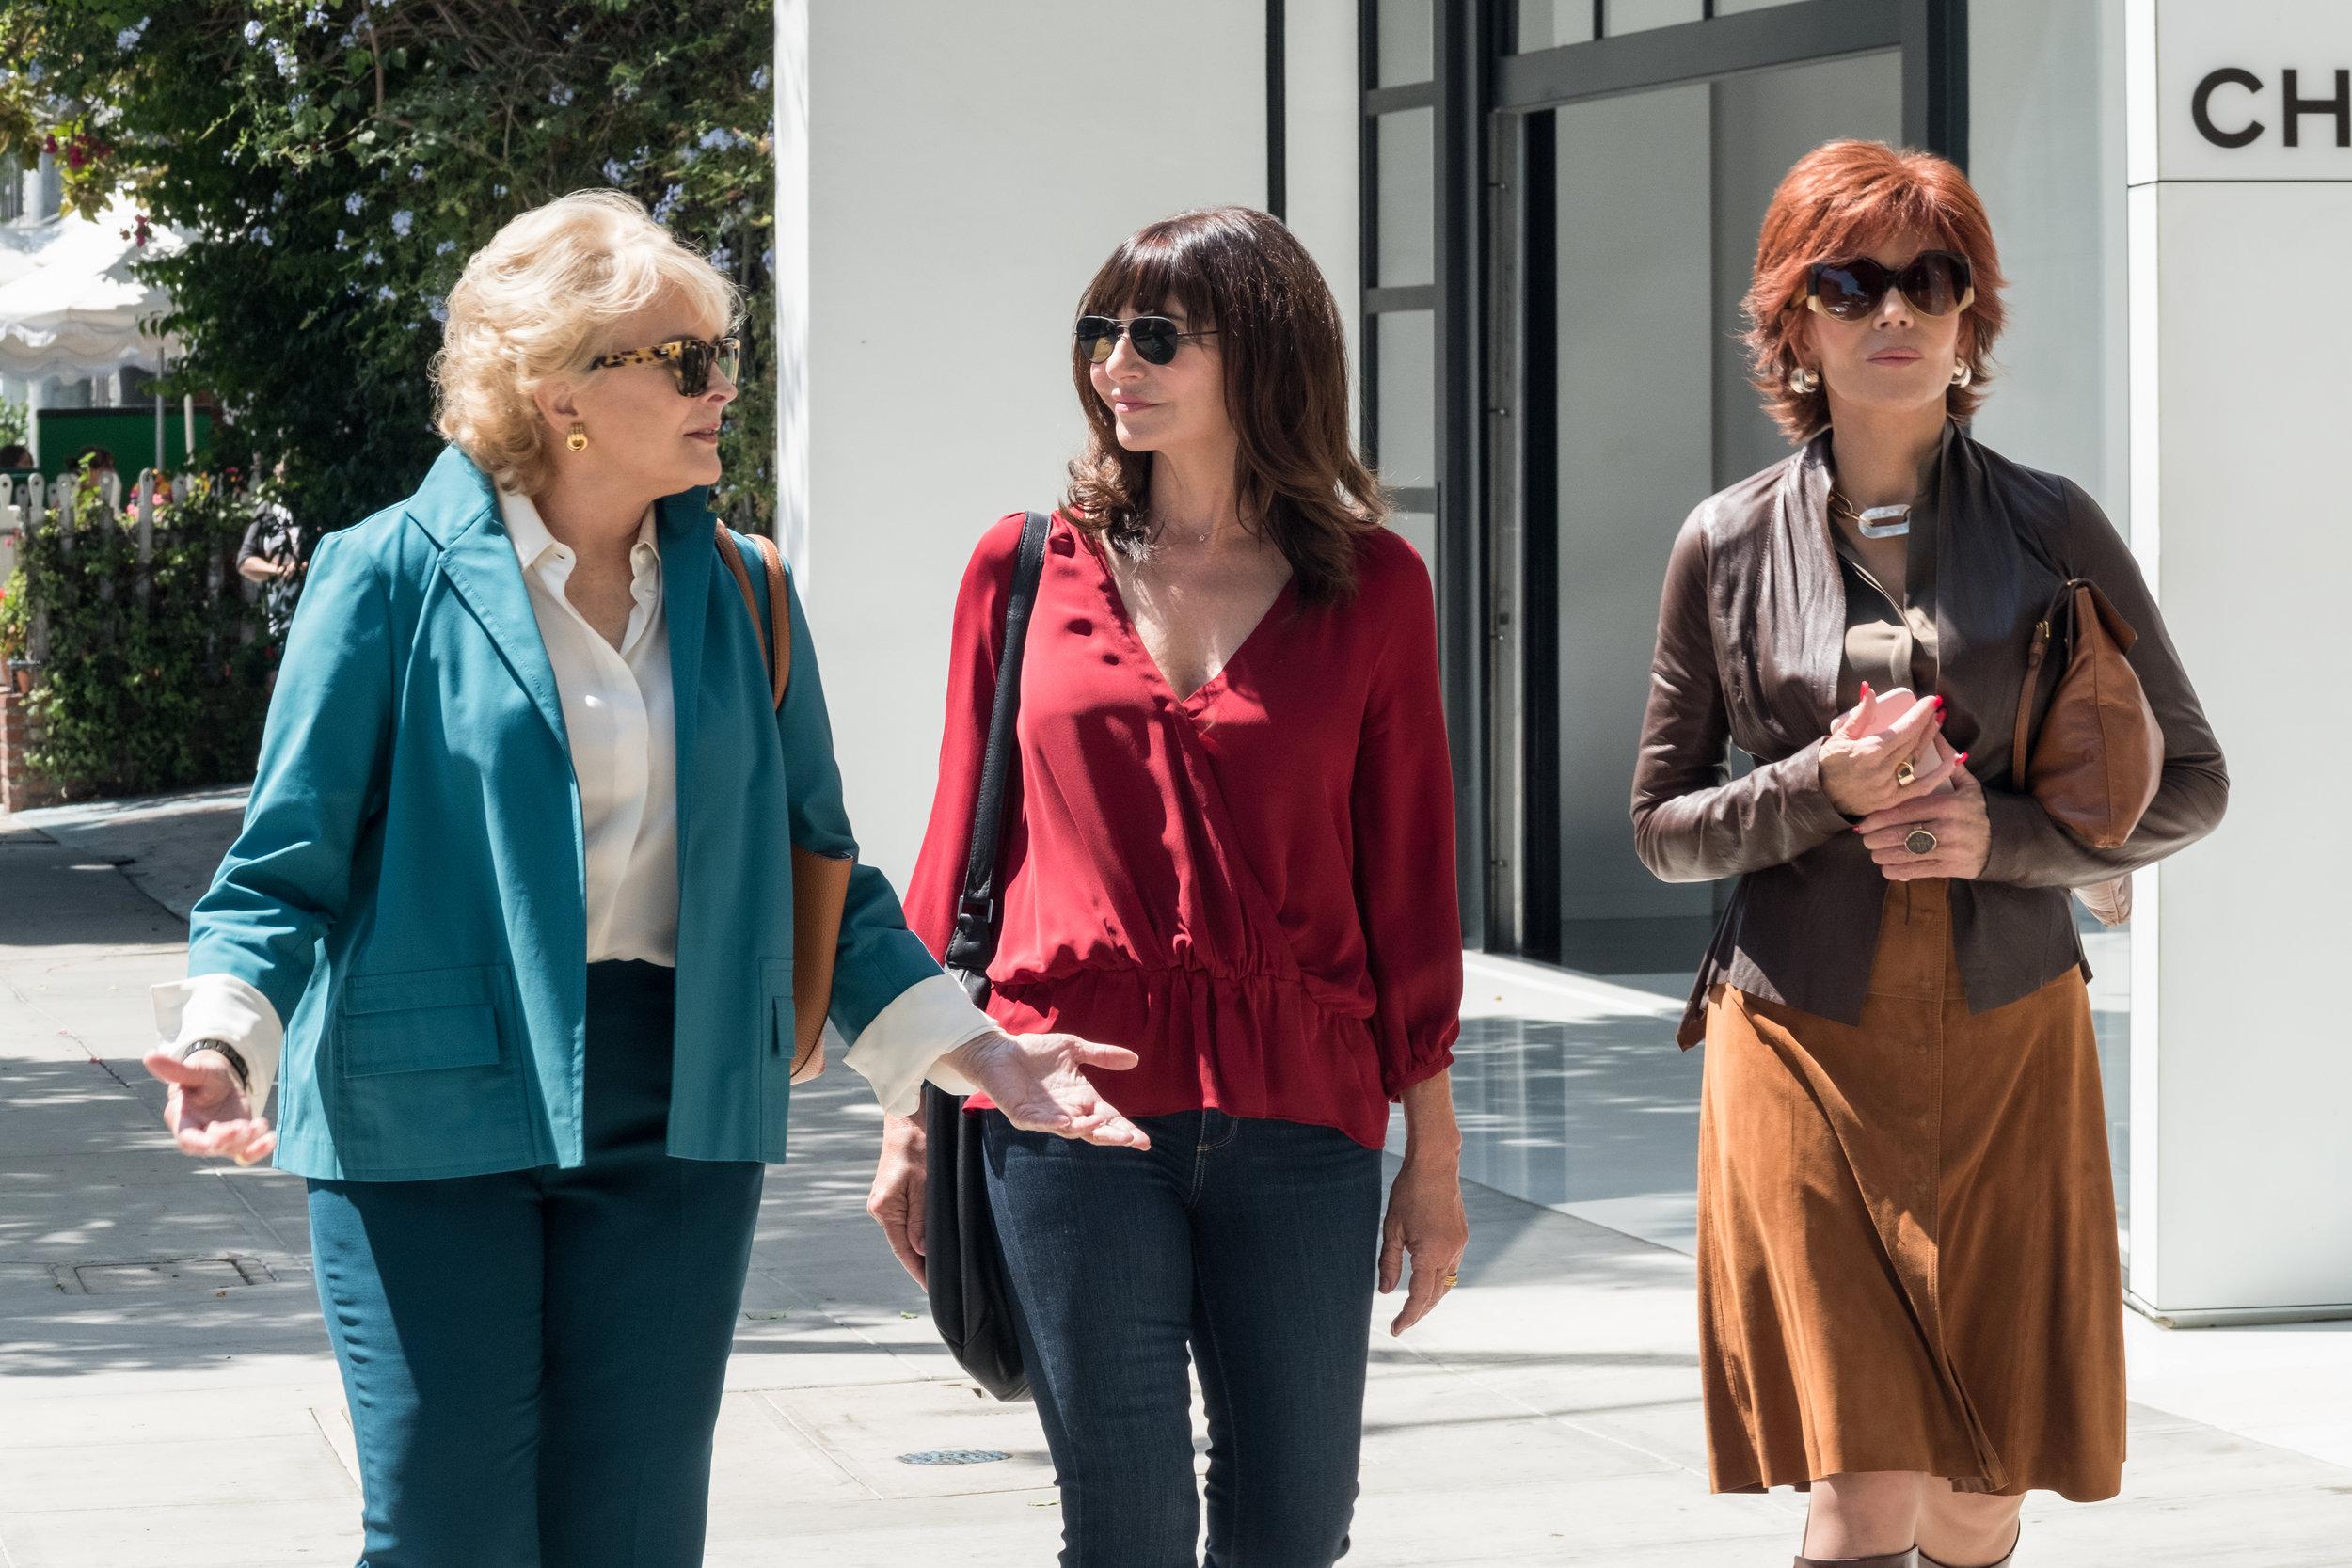 Candice Bergen, Mary Steenburgen and Jane Fonda get literary in Book Club